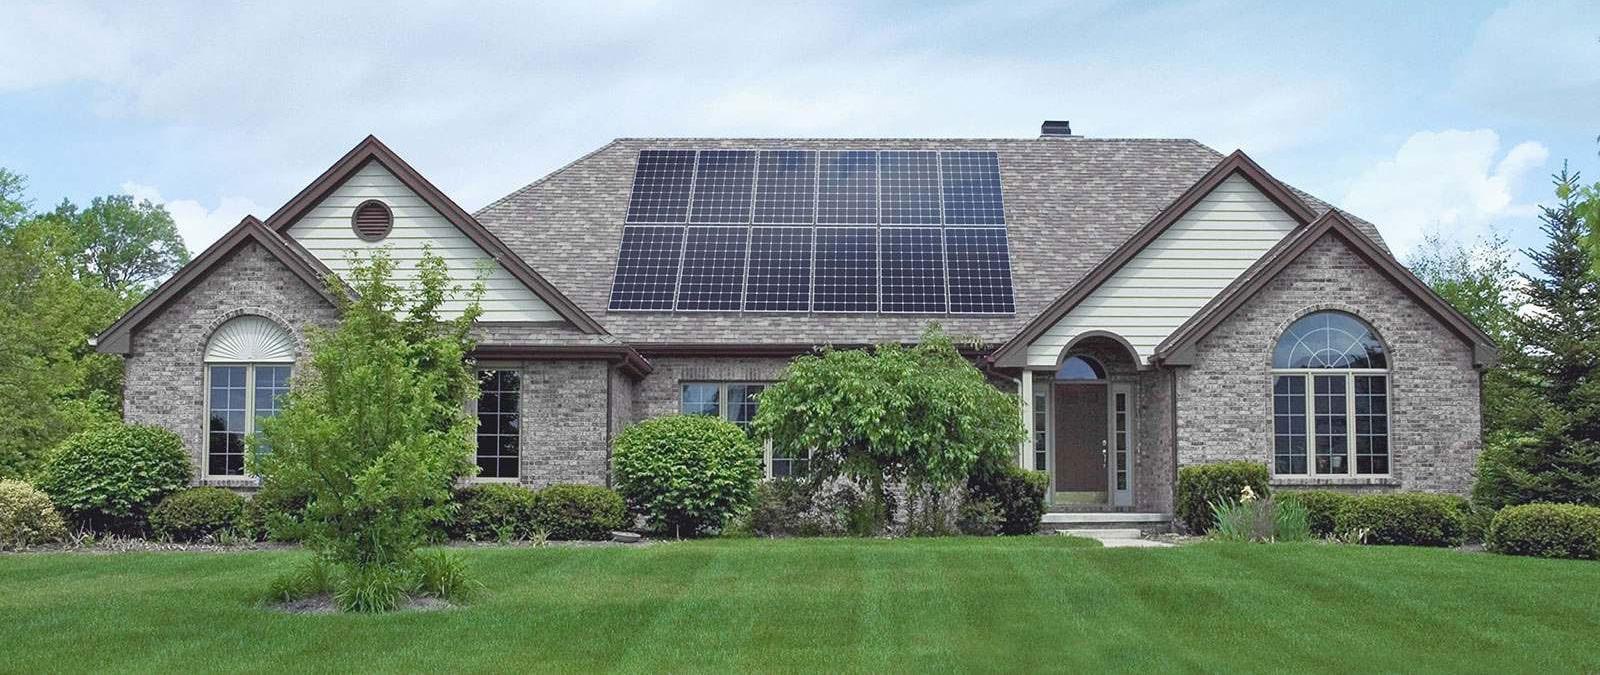 http://pannelli-fotovoltaici-LG-casa